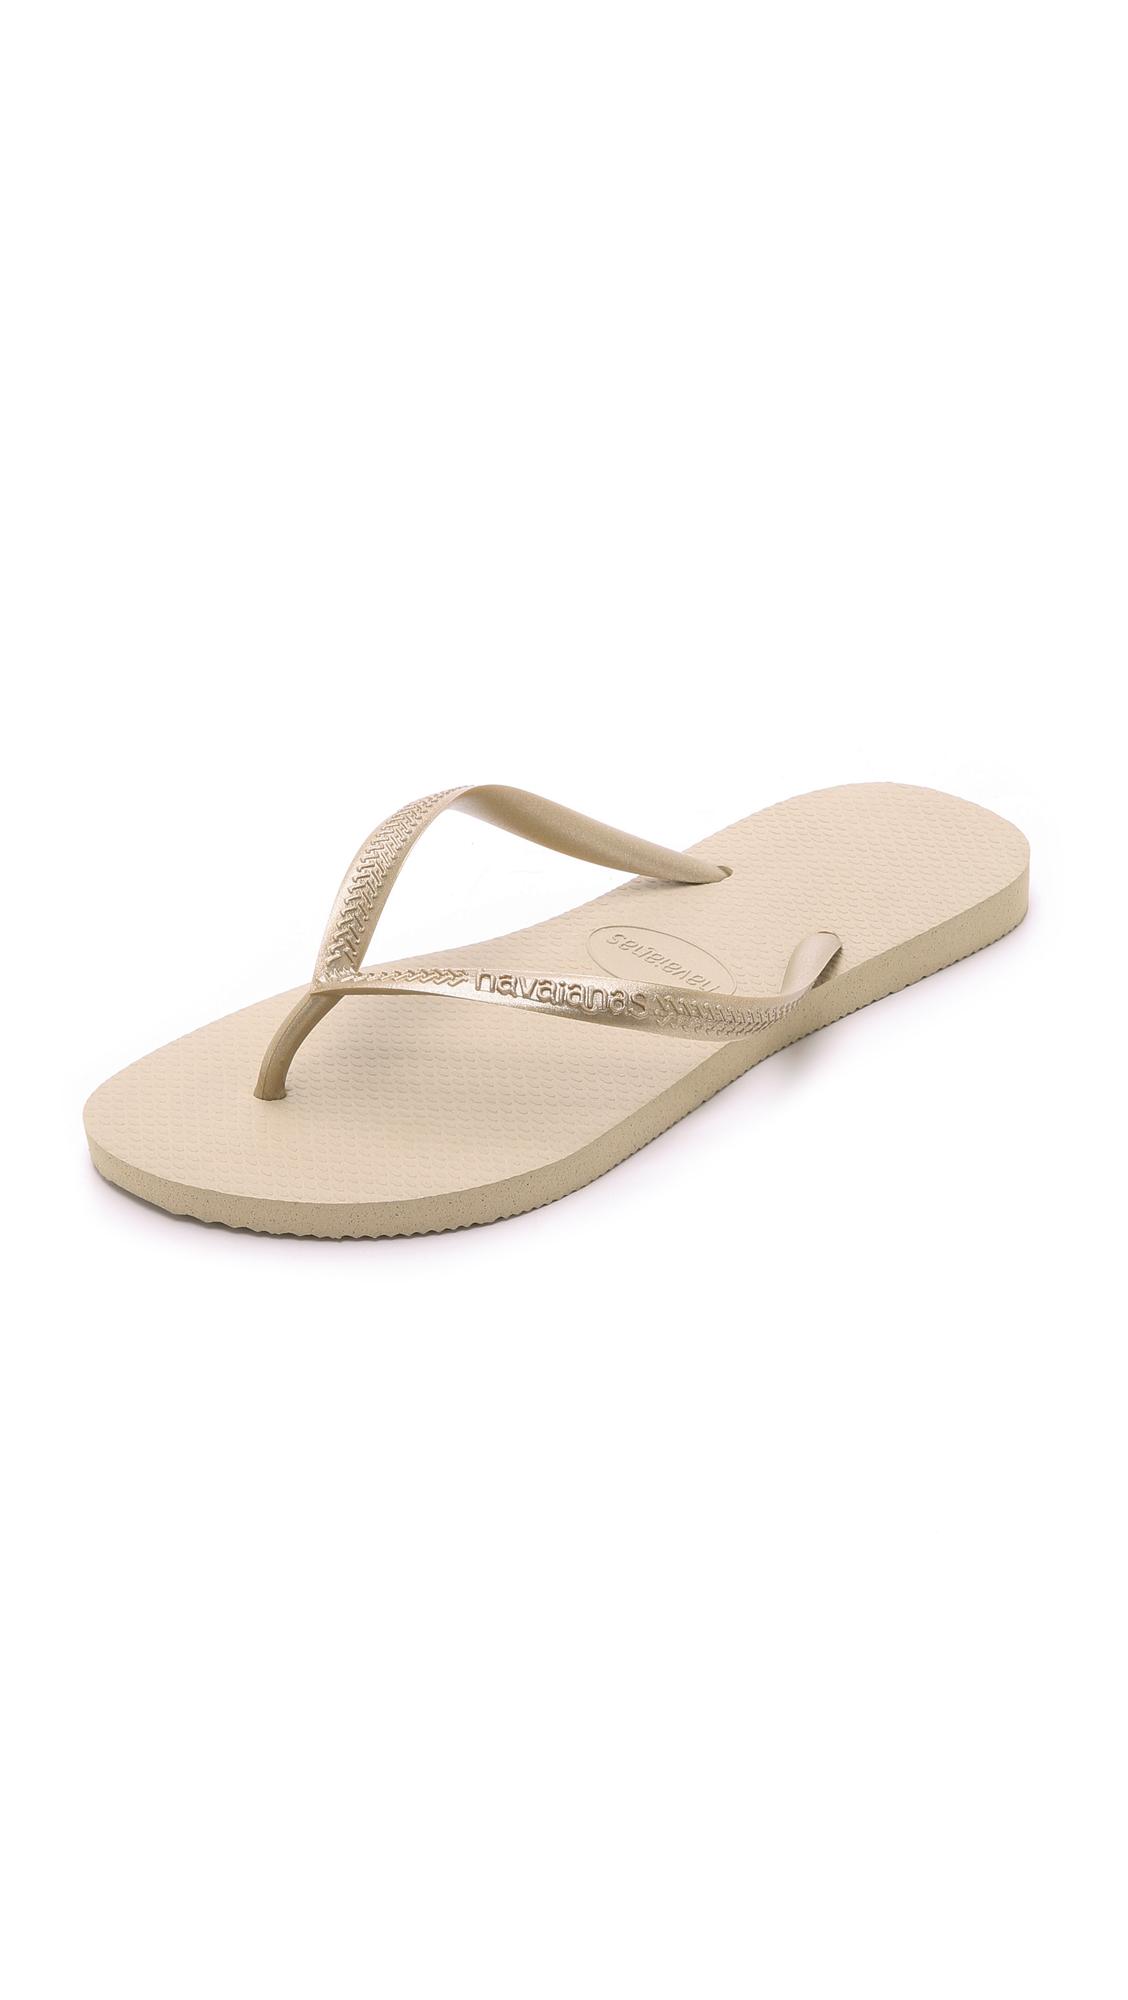 Havaianas Slim Flip Flops - Sand Grey/Light Golden at Shopbop